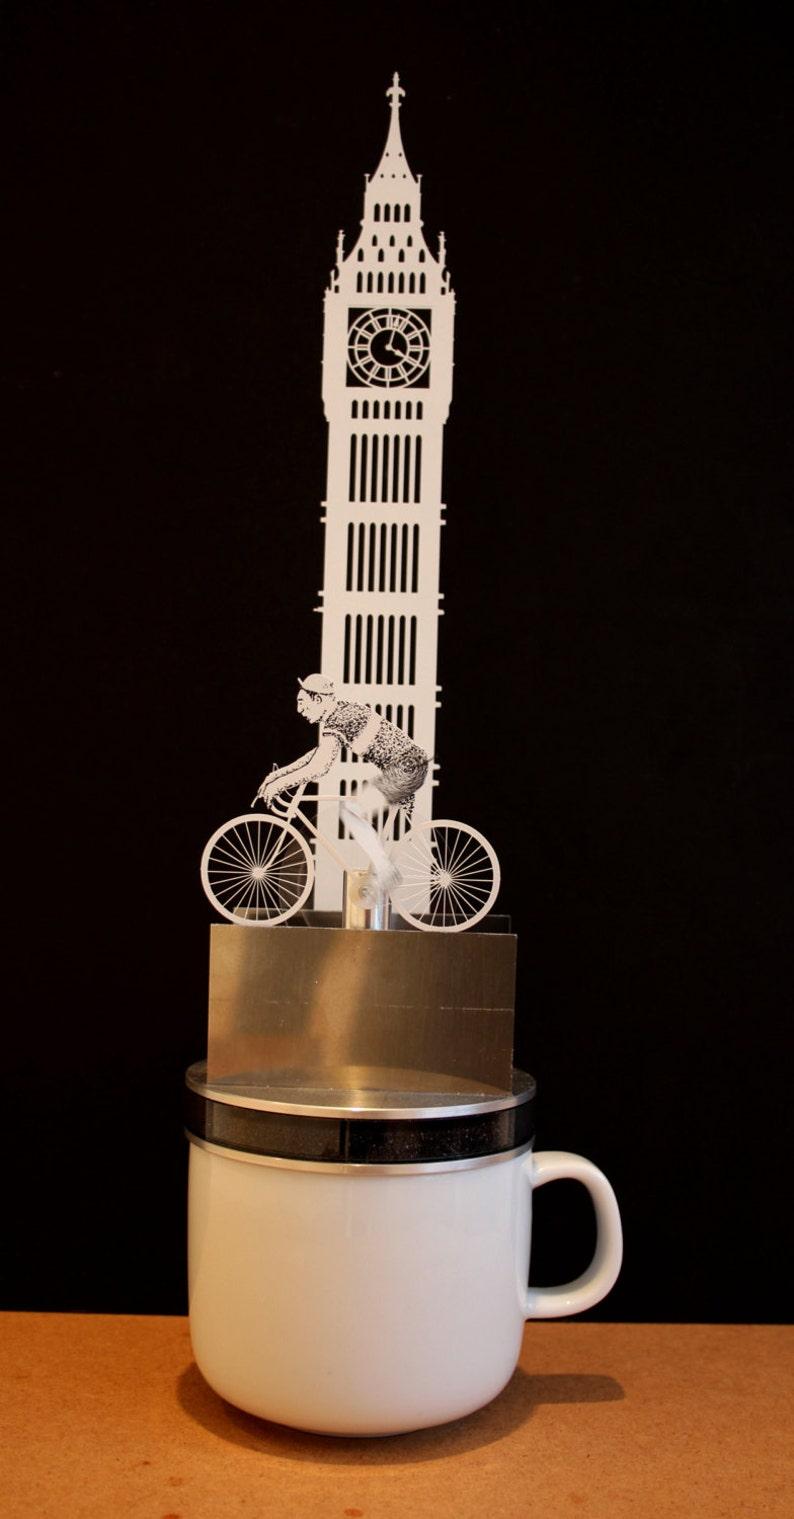 Tea driven bicycle automata image 0